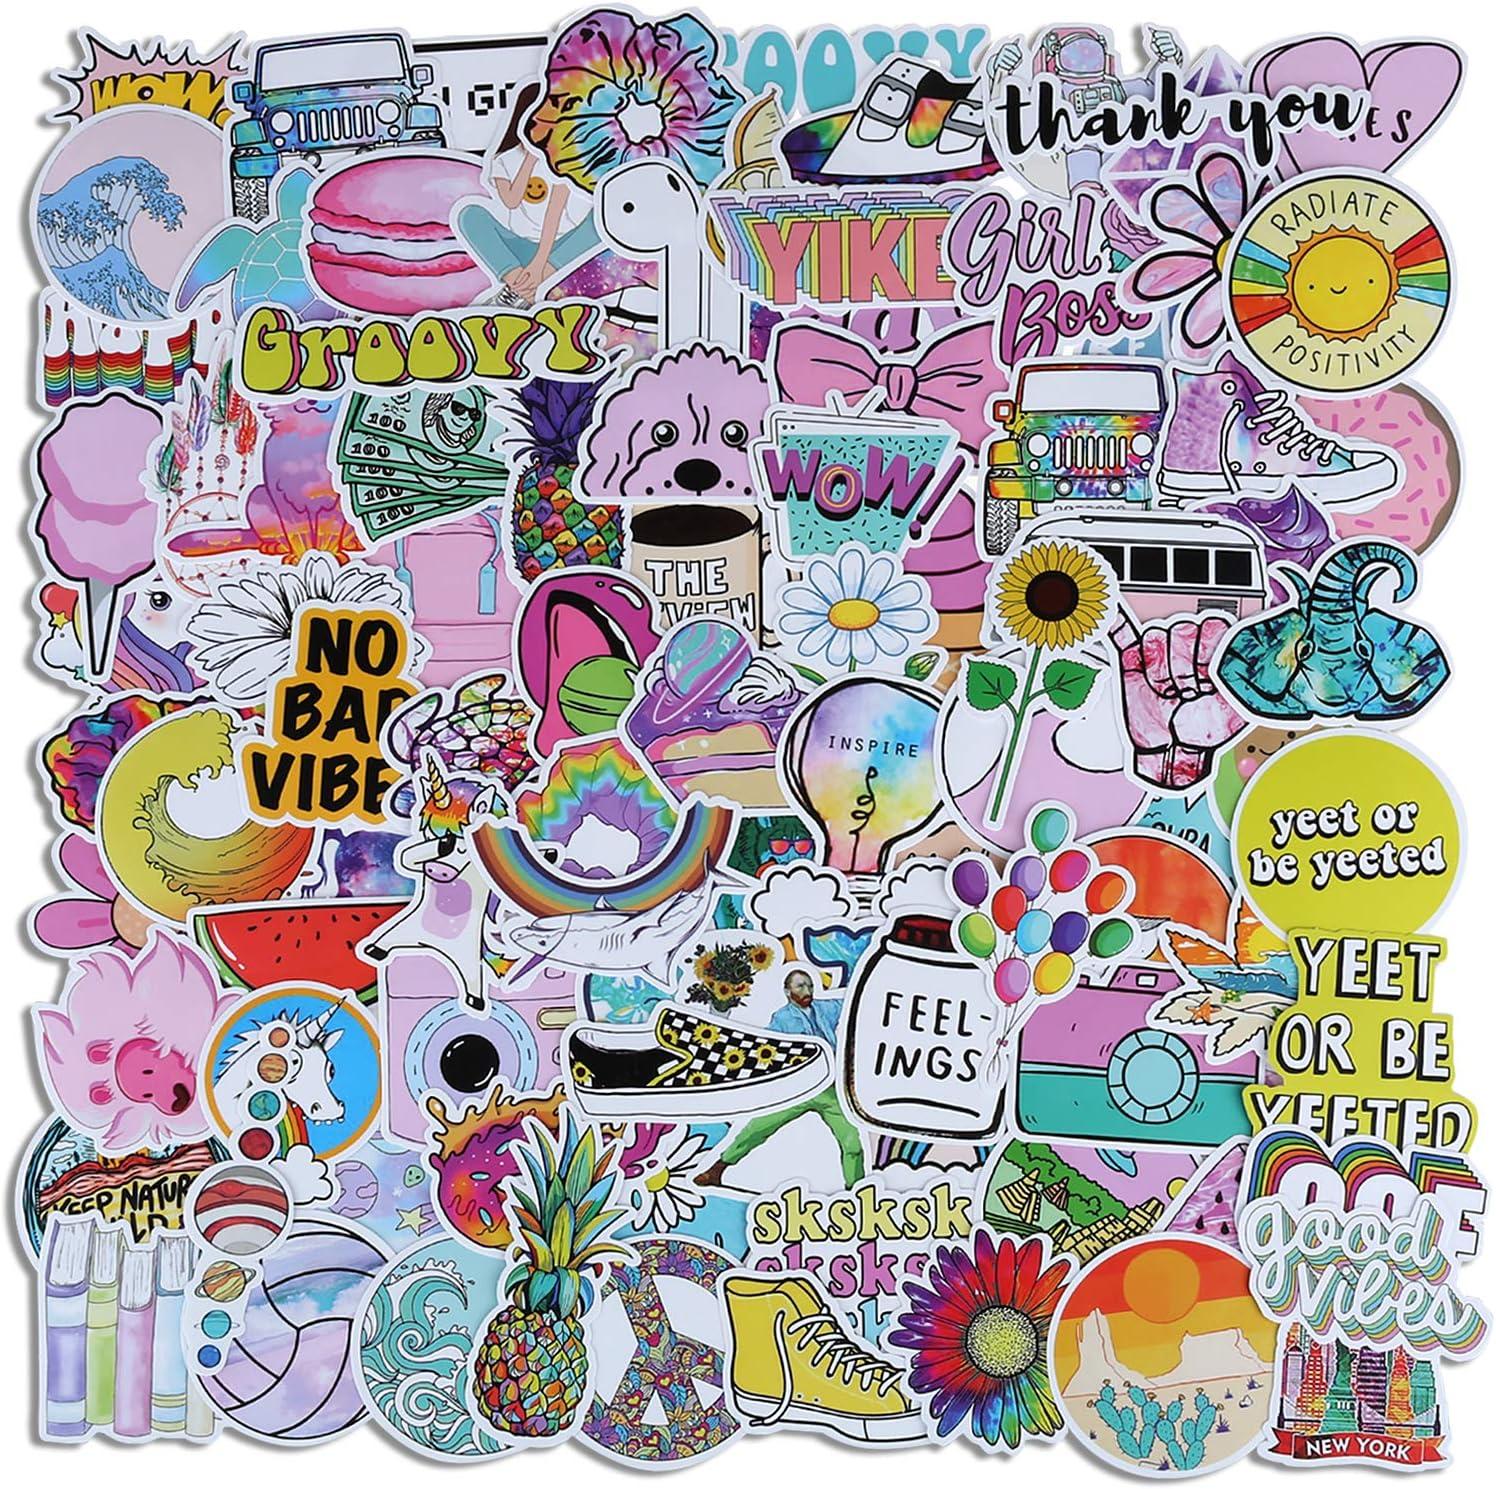 Cute Vsco Stickers for Water Bottles, 100 Pcs Random Pink Vinyl Aesthetic Laptop Stickers, Trendy Cool Graffiti Stickers for Teens Kids Girls.